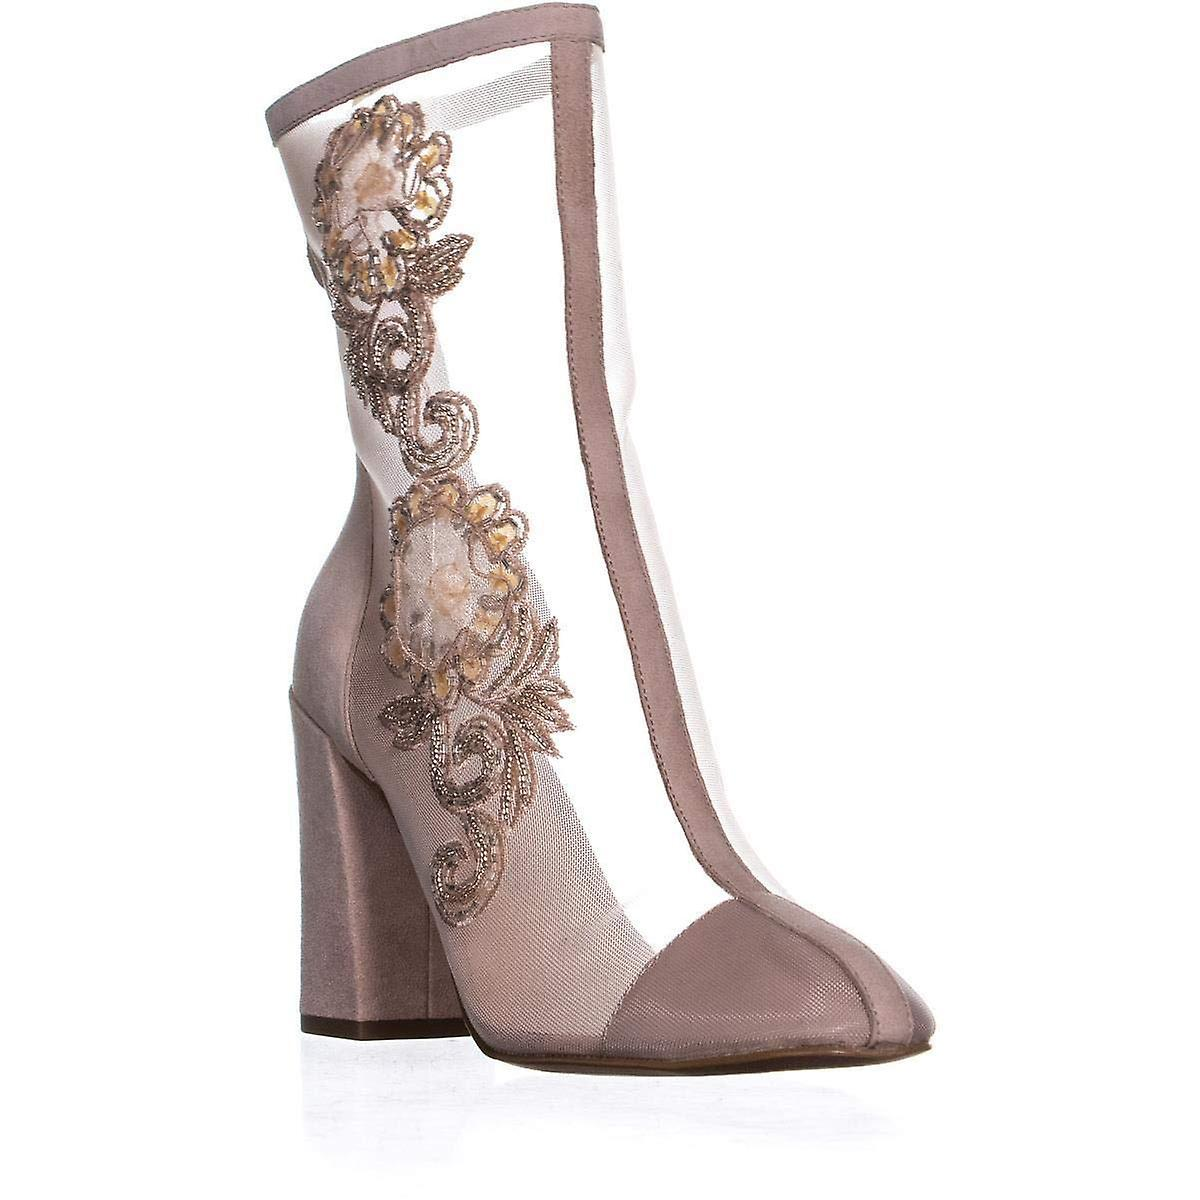 Avec Les Filles Womens reagan fermé orteils à mi-mollet bottes de mode buVj9B